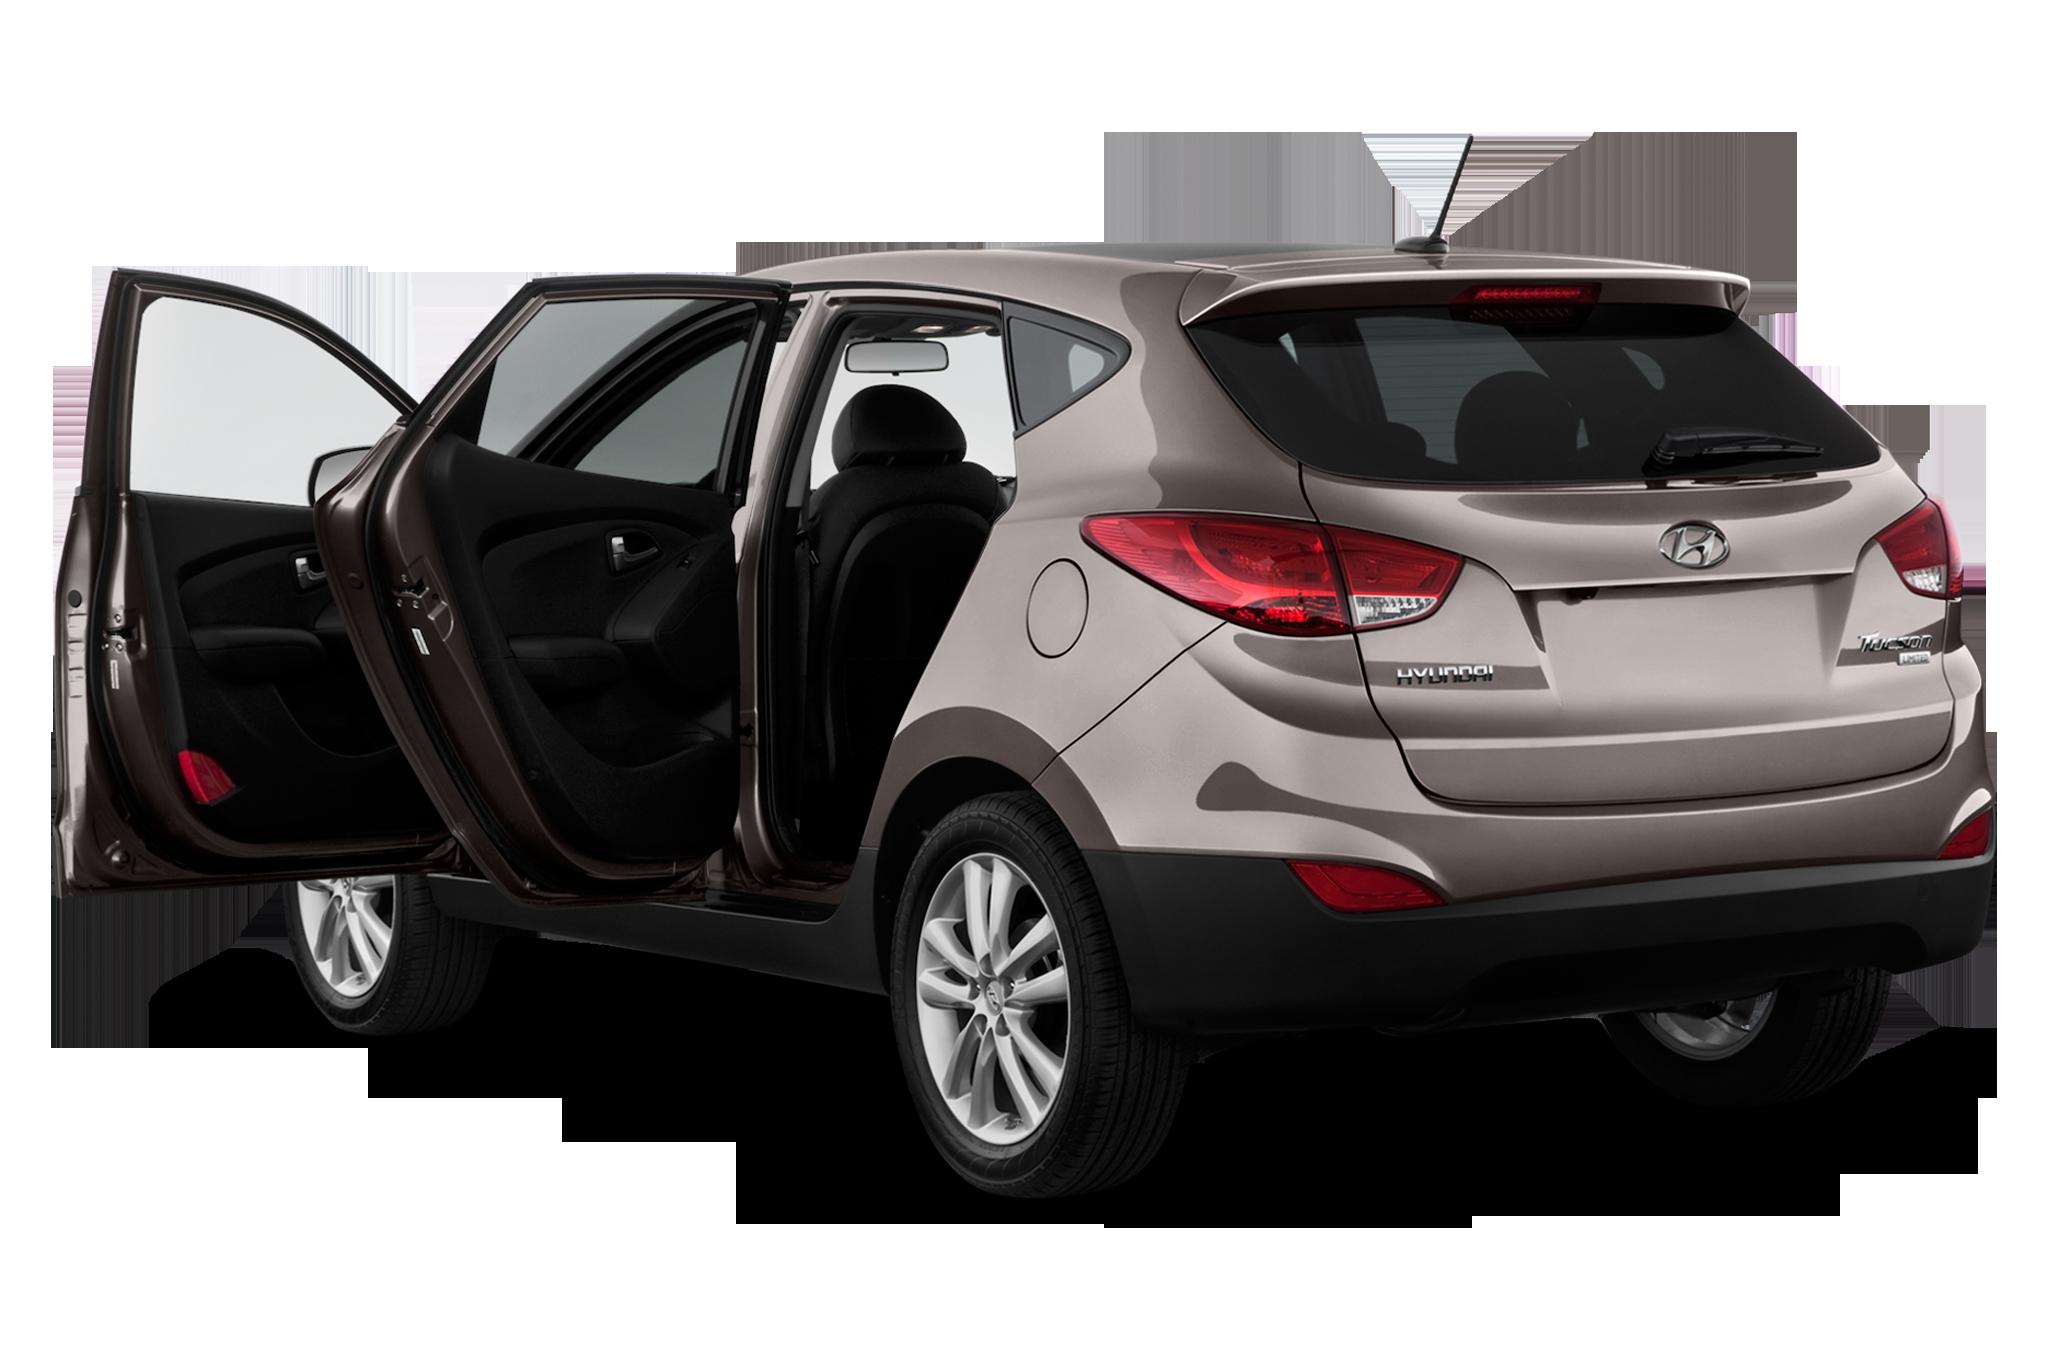 Hyundai Tucson I 2004 - 2010 SUV 5 door #6